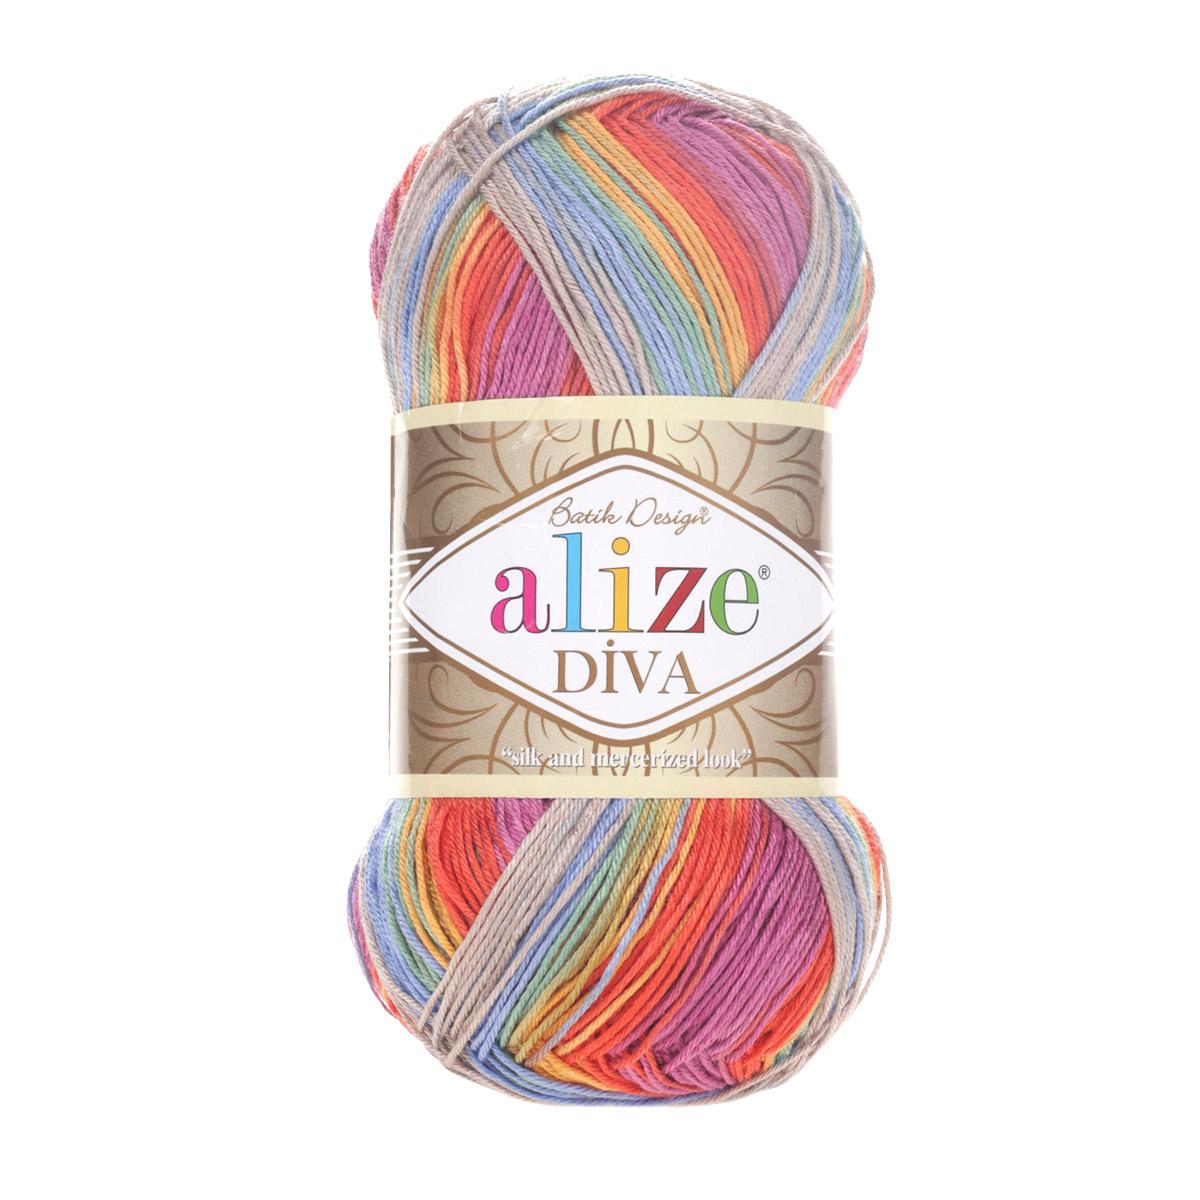 Пряжа ALIZE 'Diva batik' 100гр. 350м. (100% микрофибра) ТУ